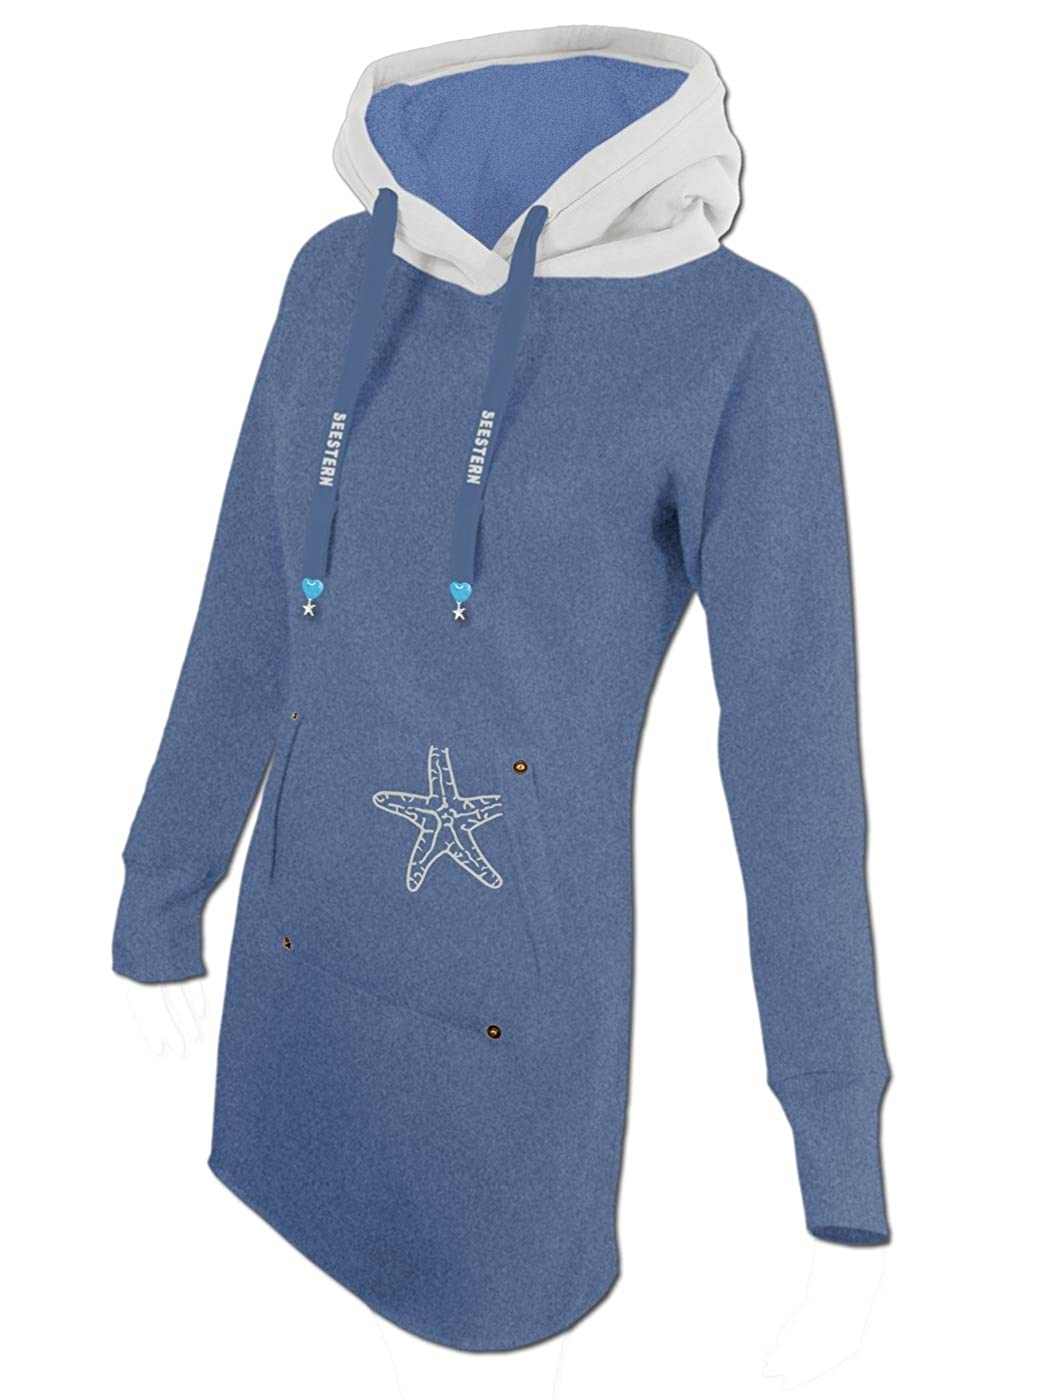 SEESTERN Damen Kapuzen Sweat Shirt Jacke Pullover Zip Hoody Sweater Gr.XS-3XL